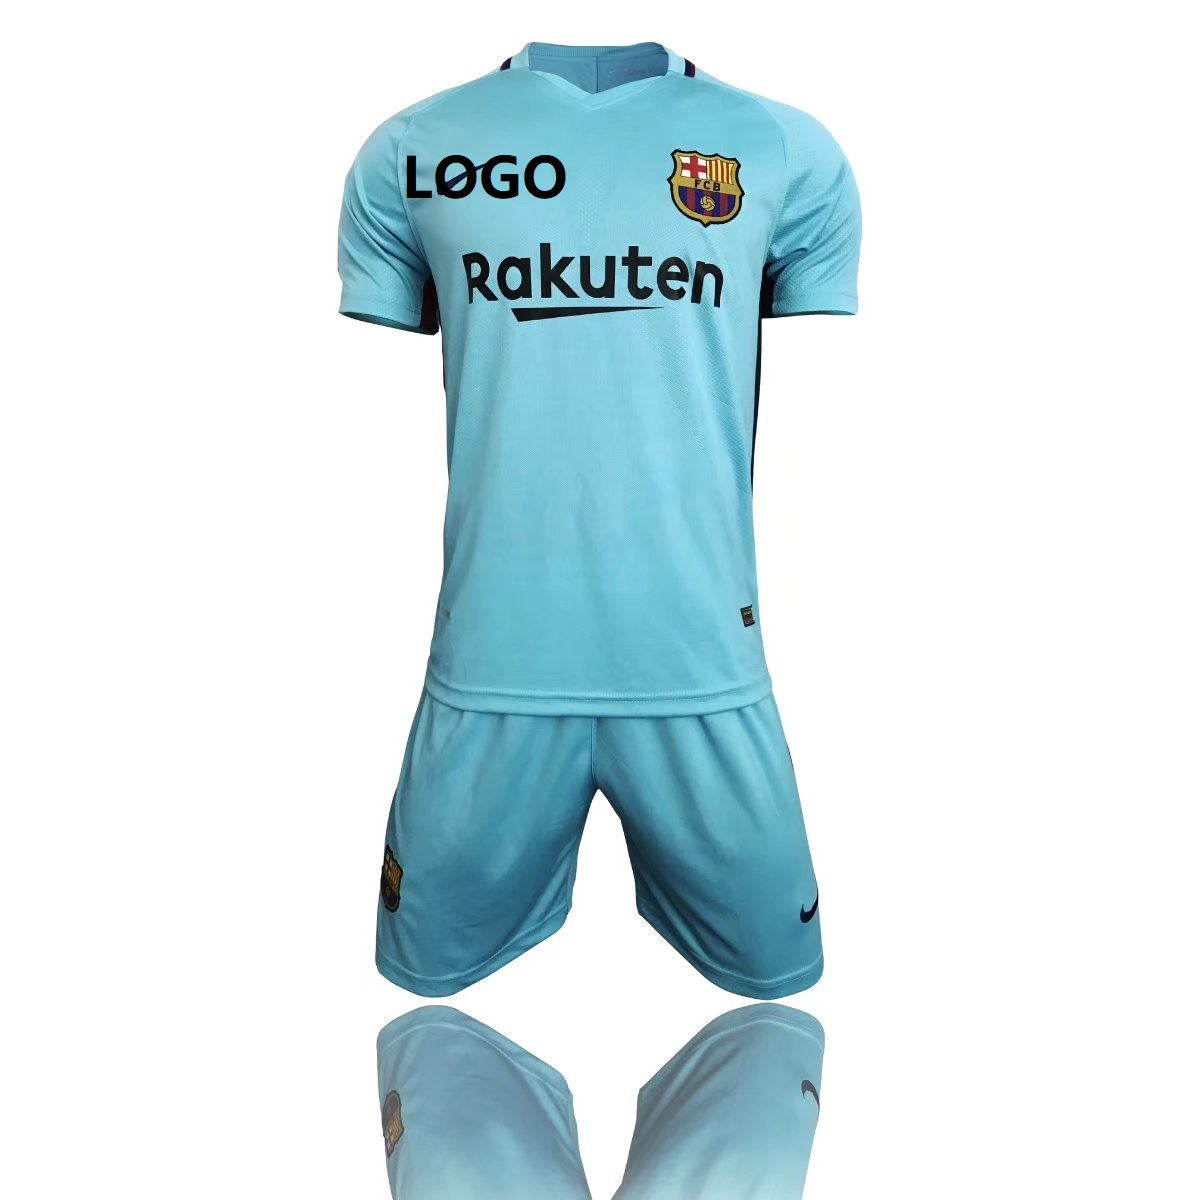 17 18 Kids Bacelona Away Blue Soccer Jersey Uniform Children Football Jersey  Kits Custom Name or Number Cheap Wholesale Item NO  436770 df3f6c299